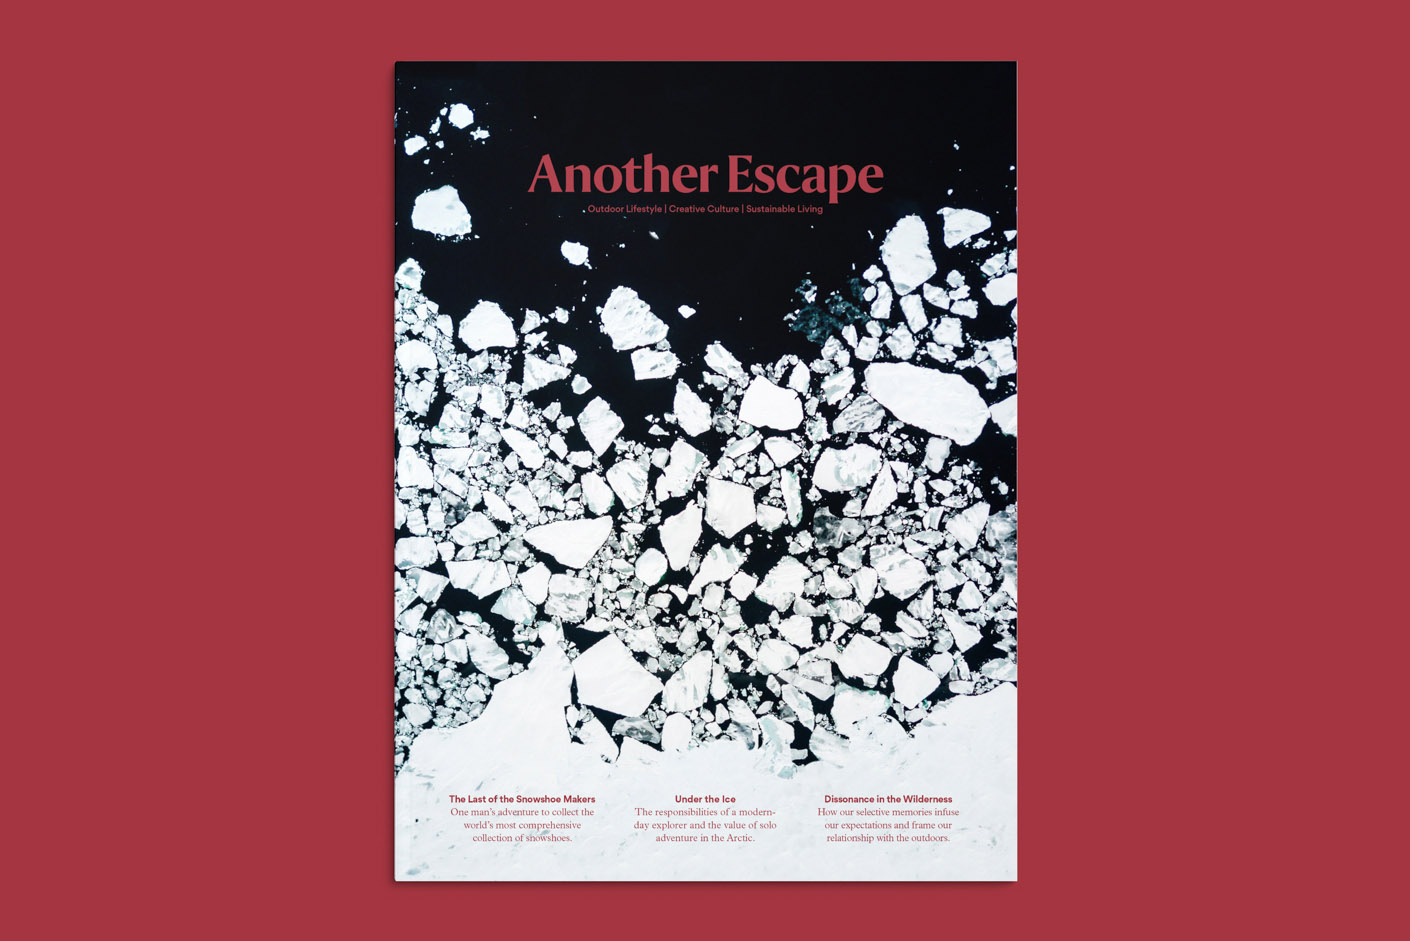 magazine-0451-2-2018-11-09